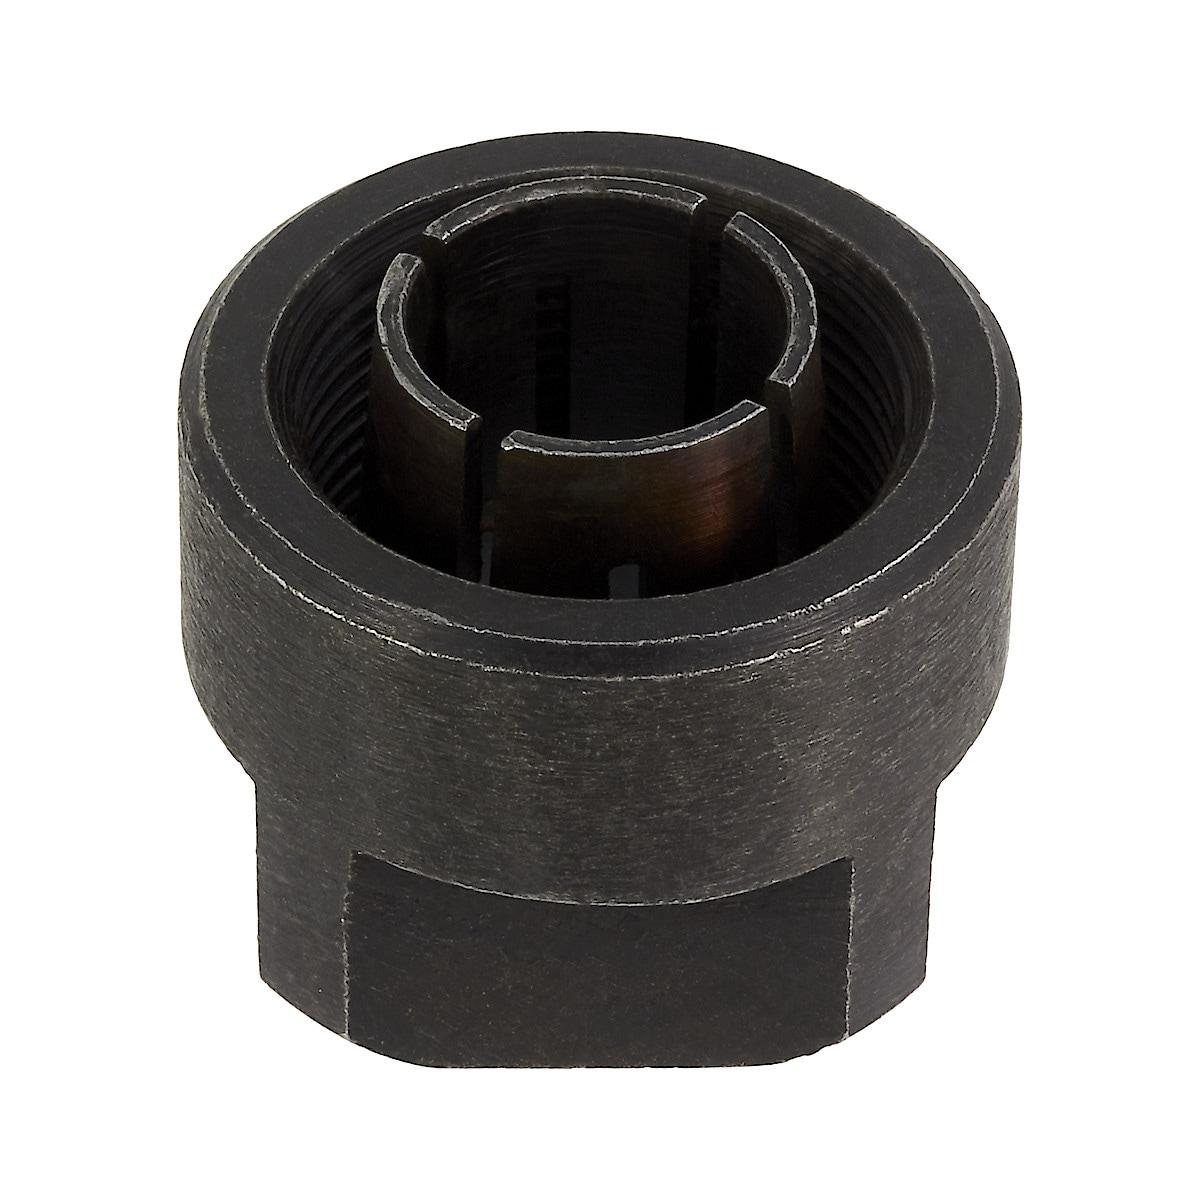 Spännhylsa/chuck 12 mm